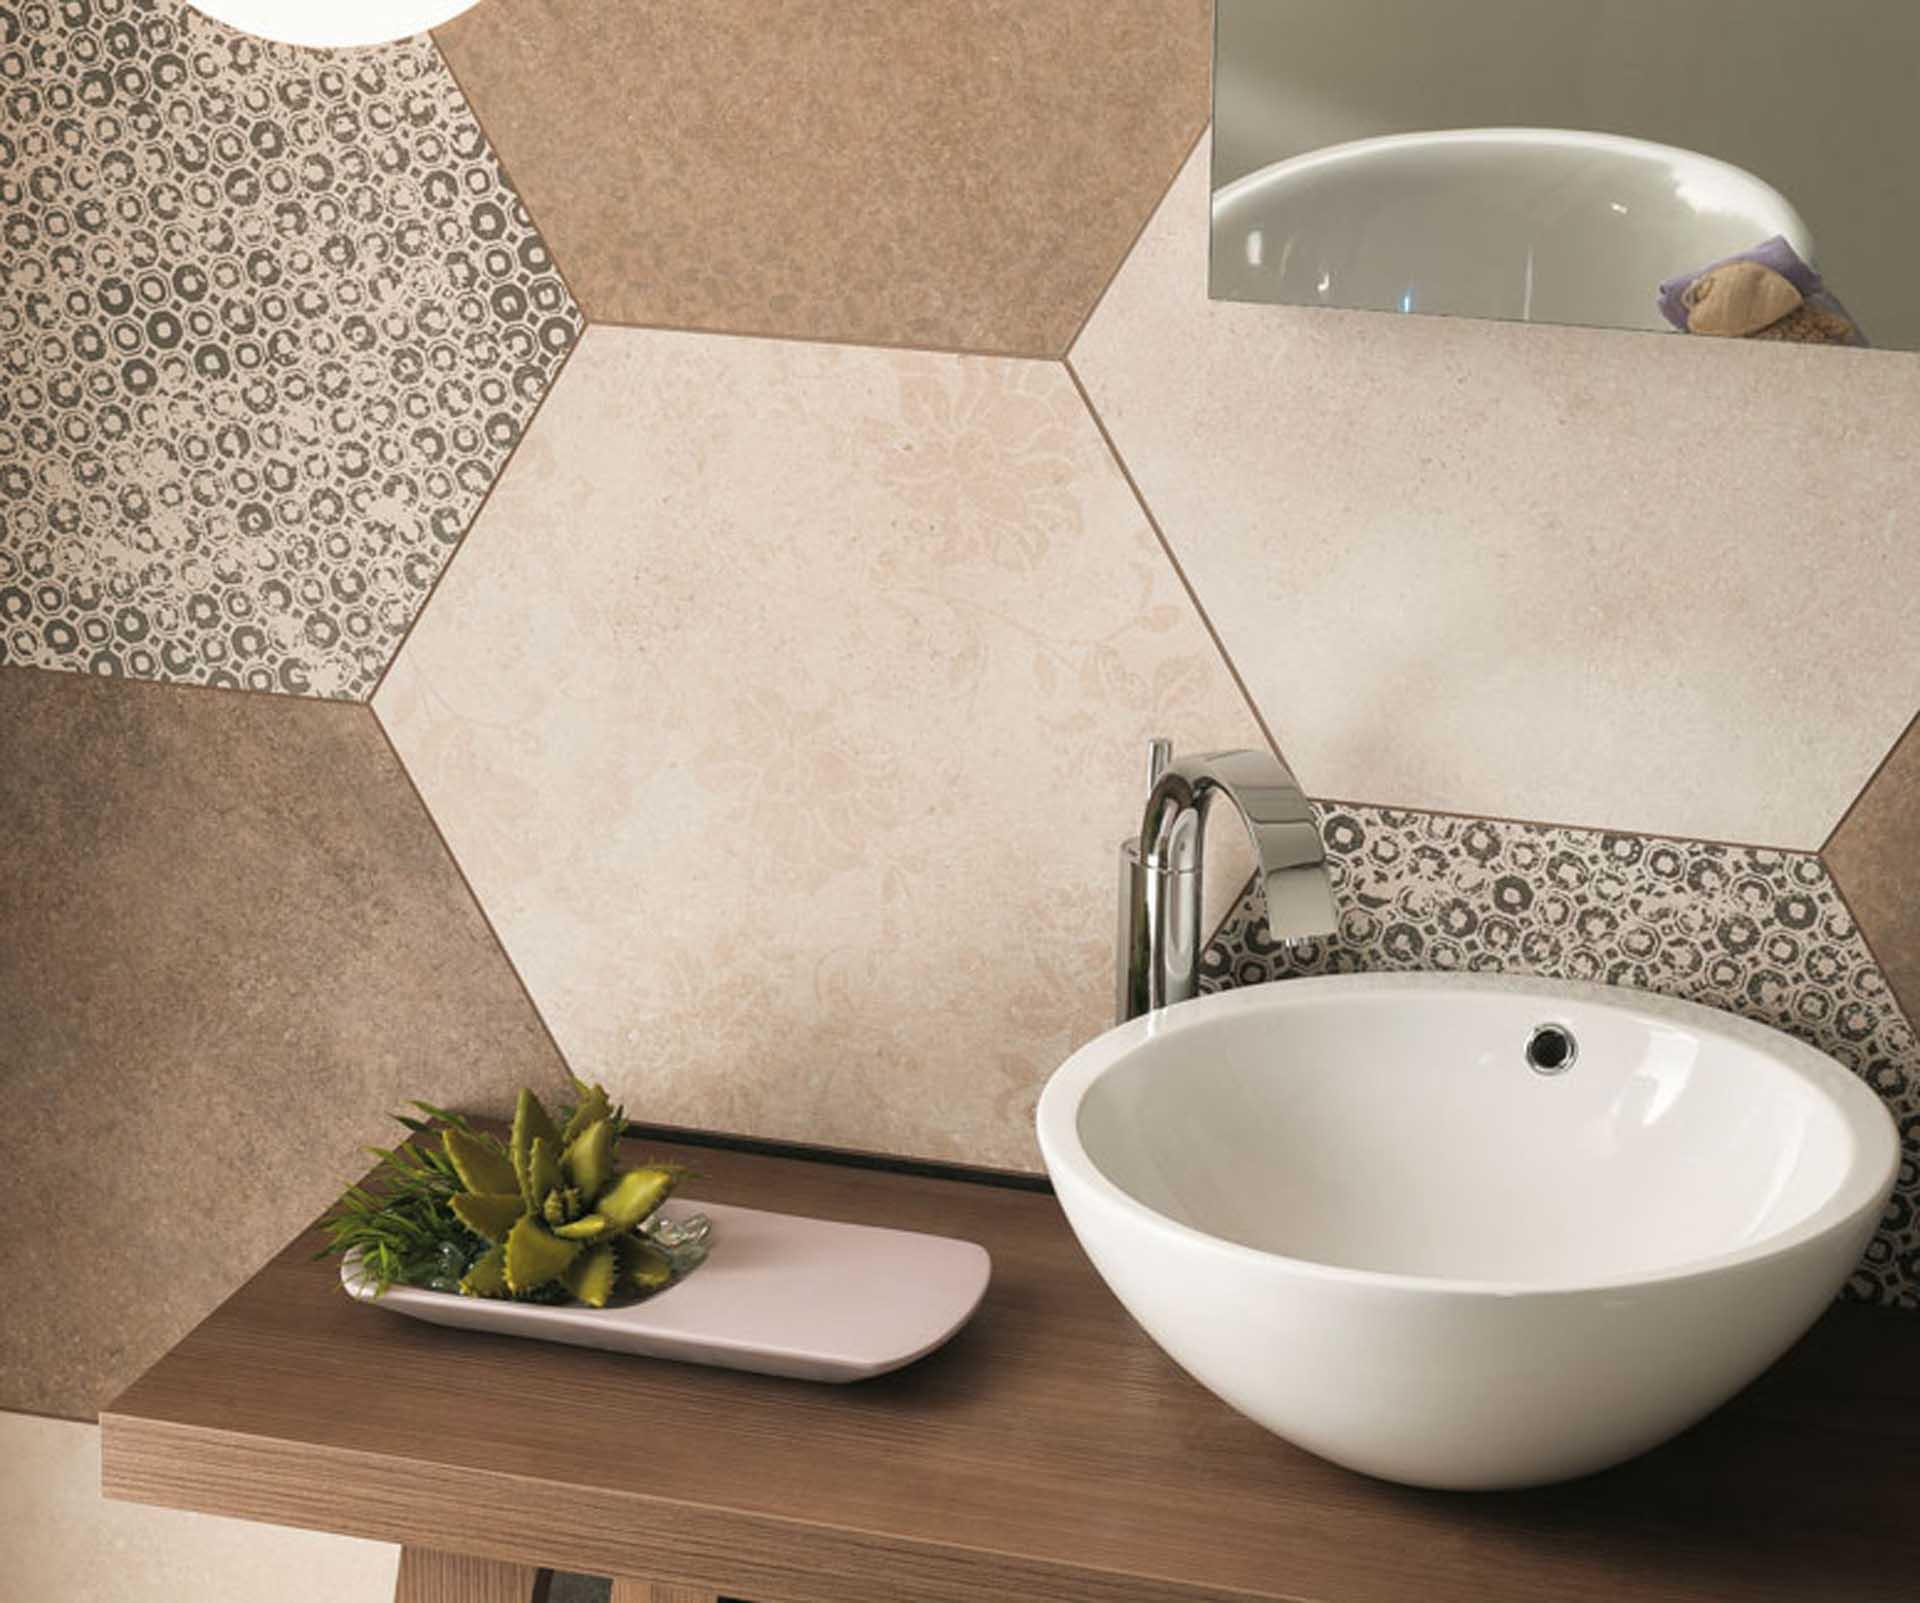 Ikea panca bagno cool hemnes rttviken mobile per lavabo - Panca ikea bagno ...